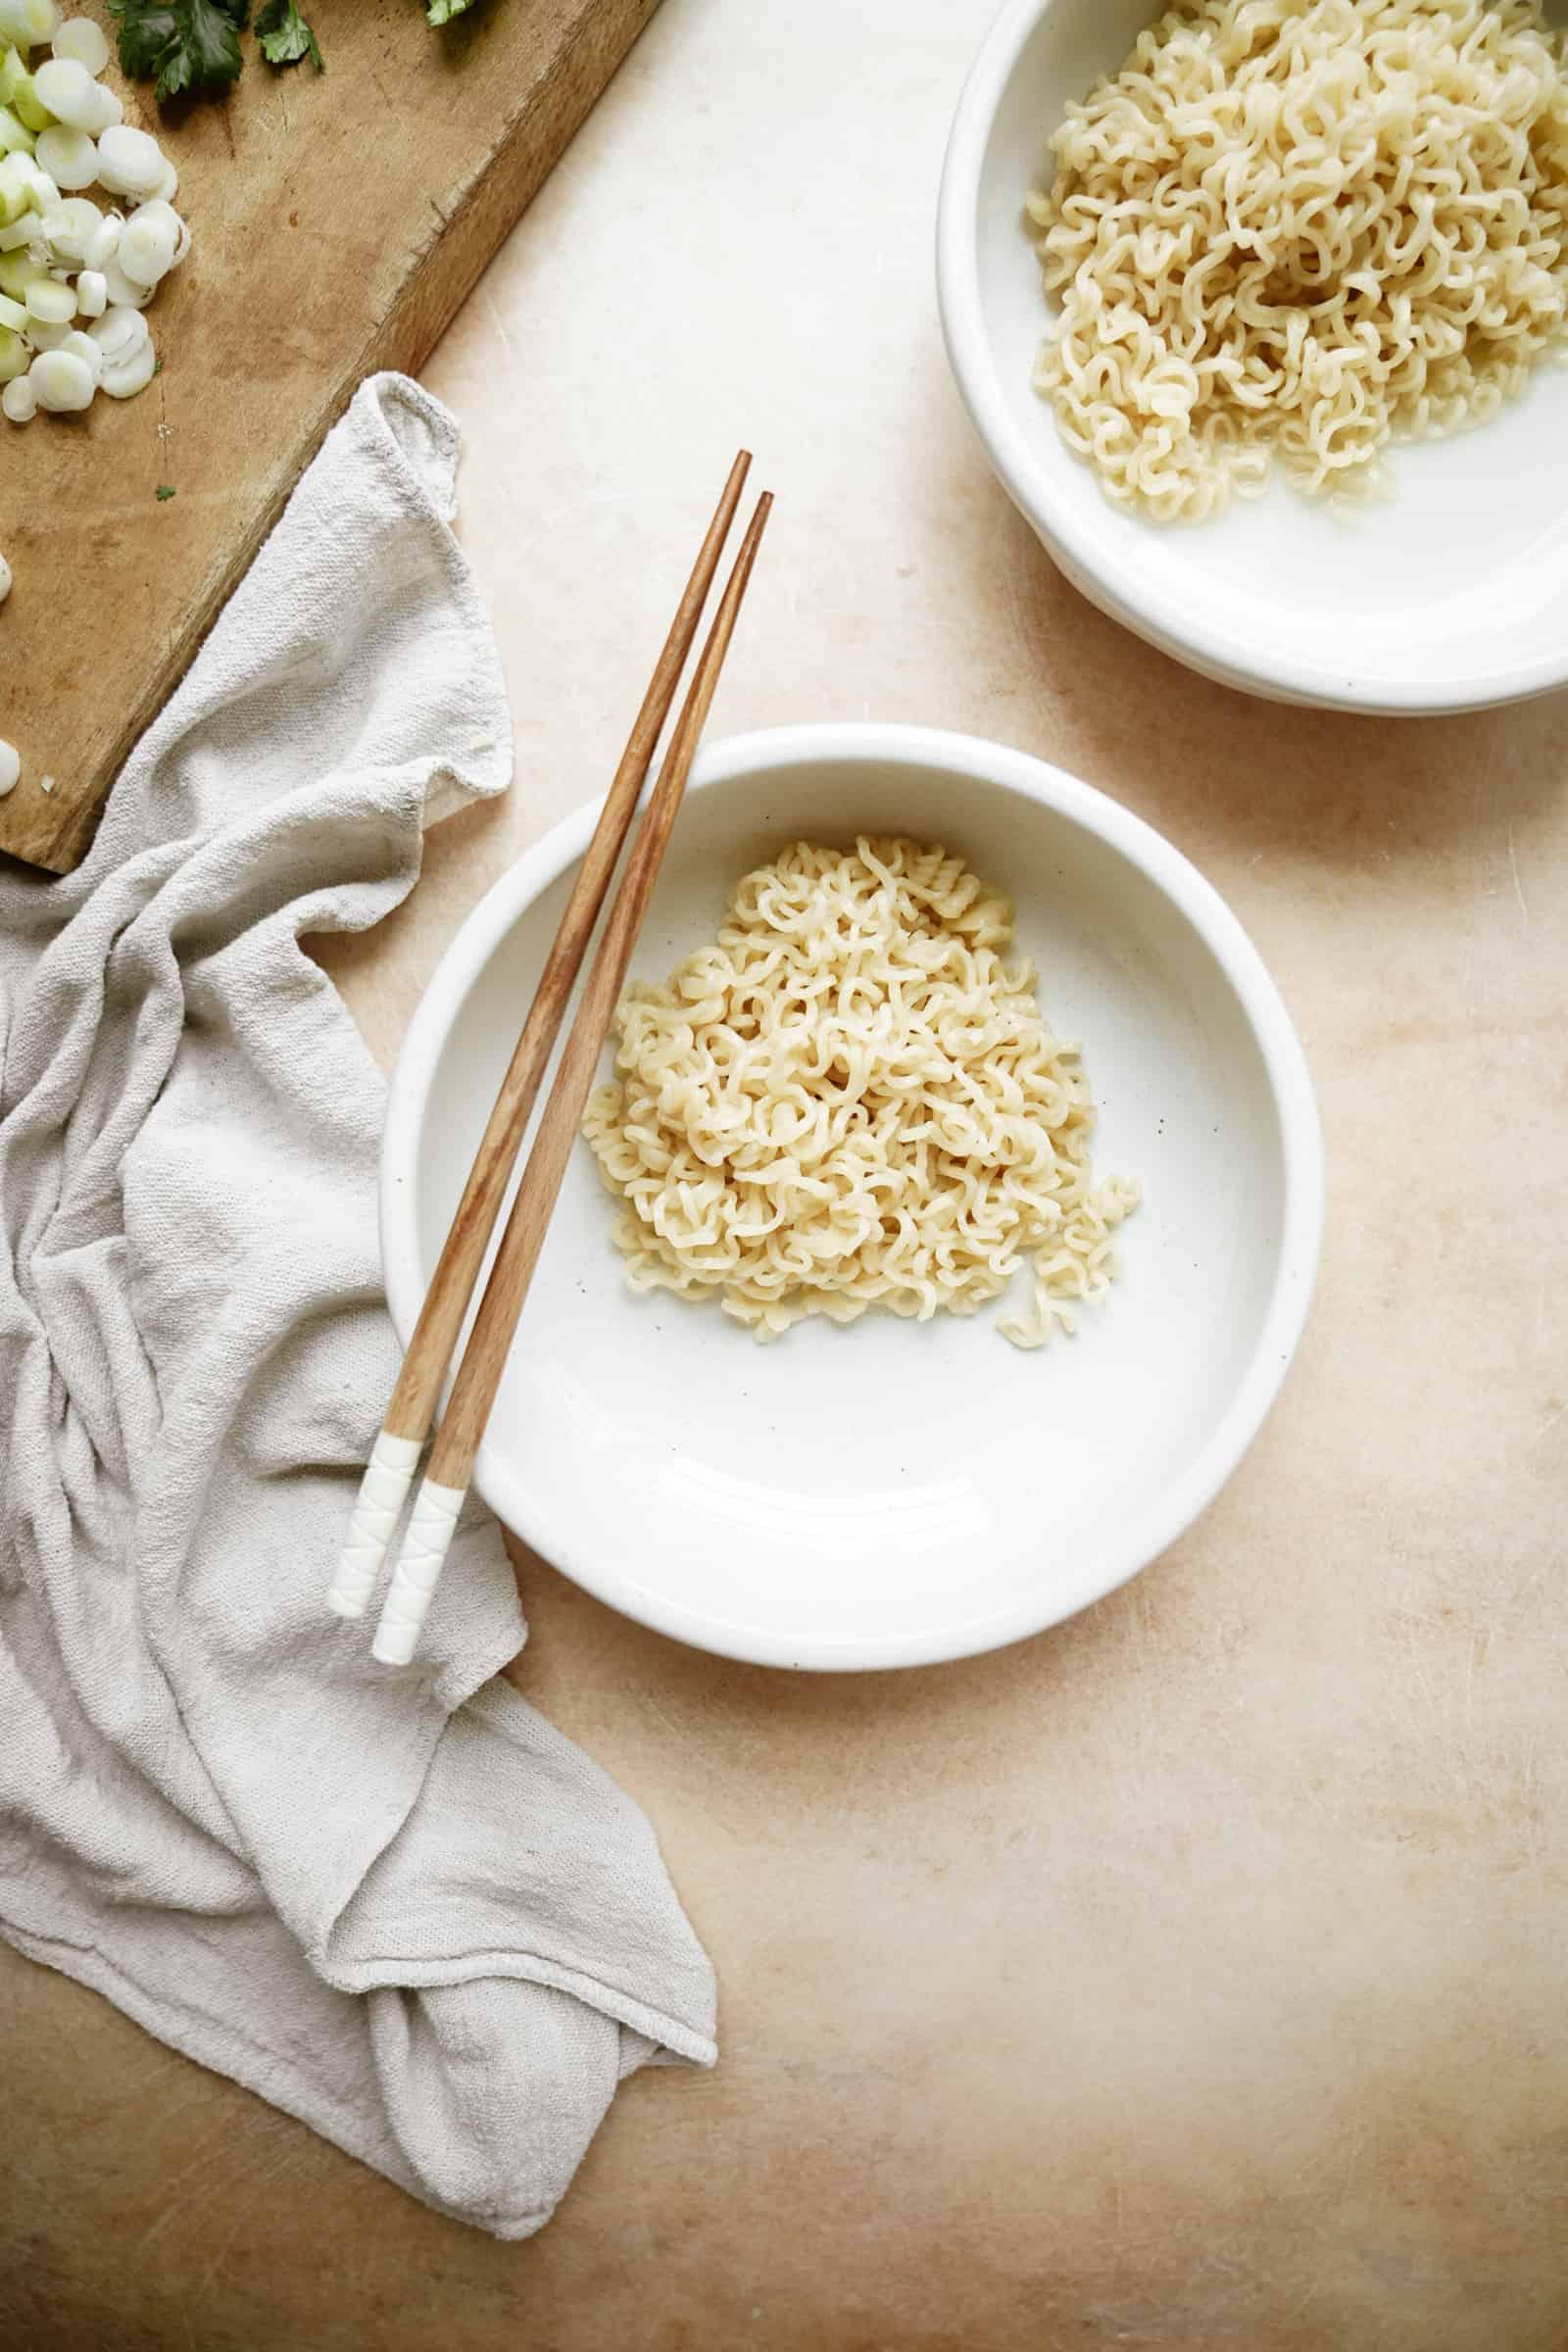 Noodles for creamy vegan ramen on a plate